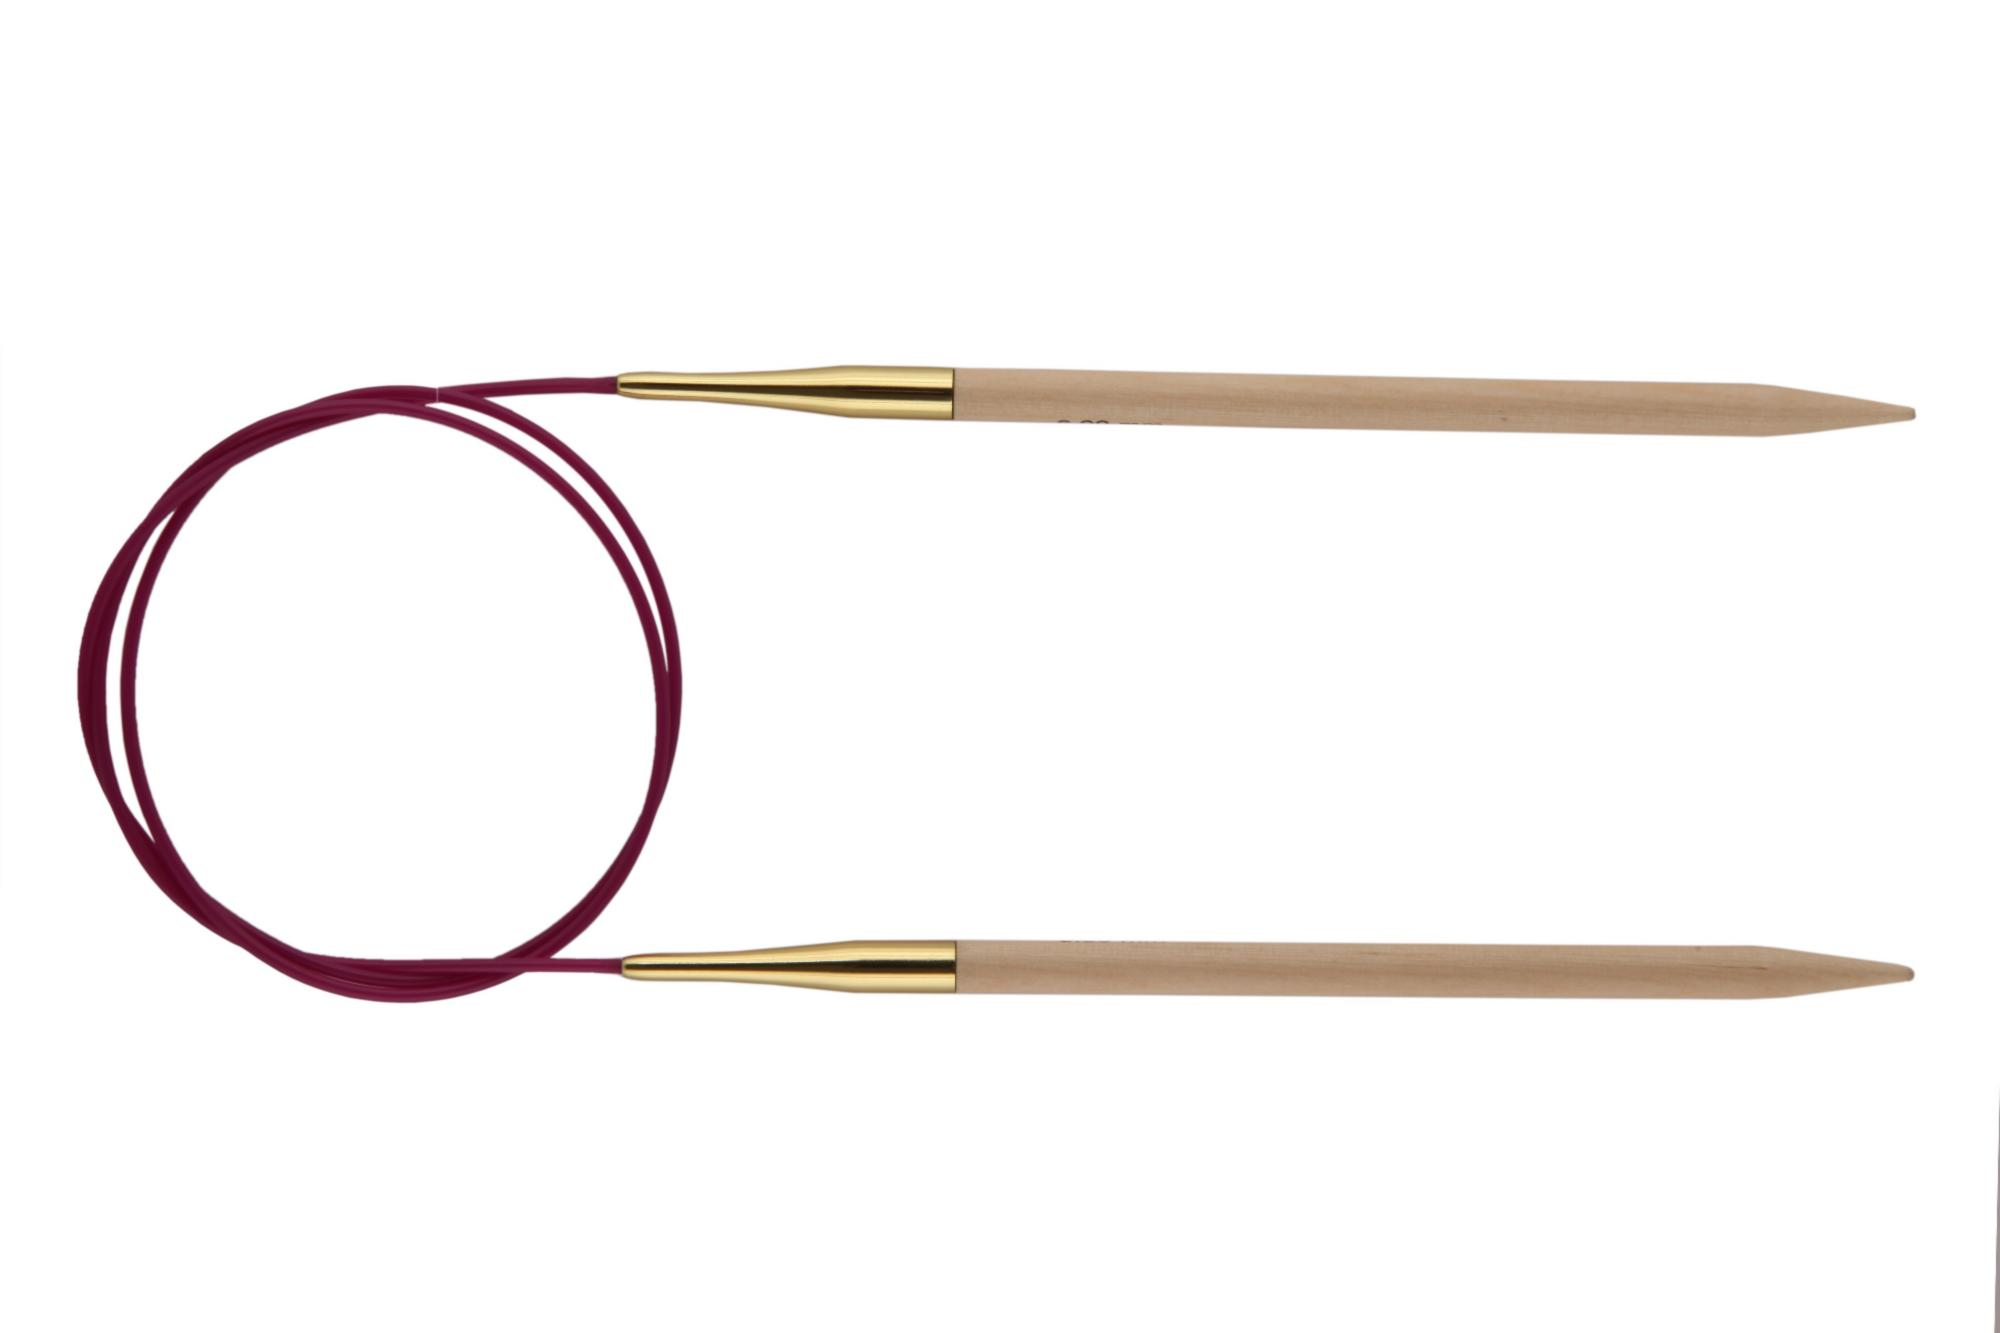 Спицы круговые 60 см Basix Birch Wood KnitPro, 35608, 3.75 мм